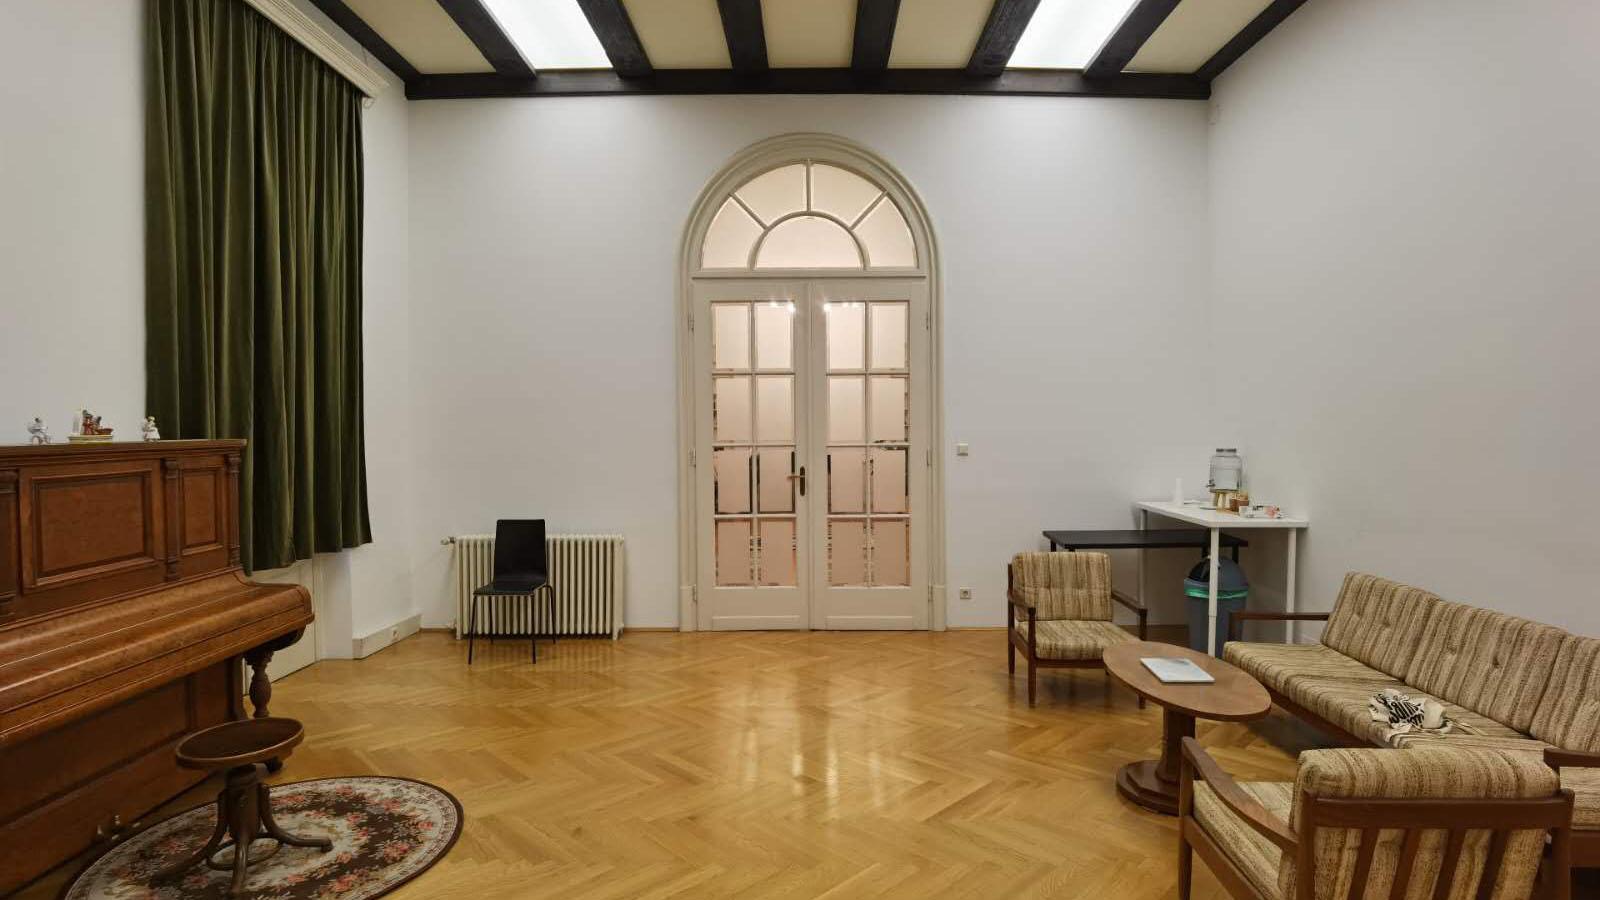 Rome Hall